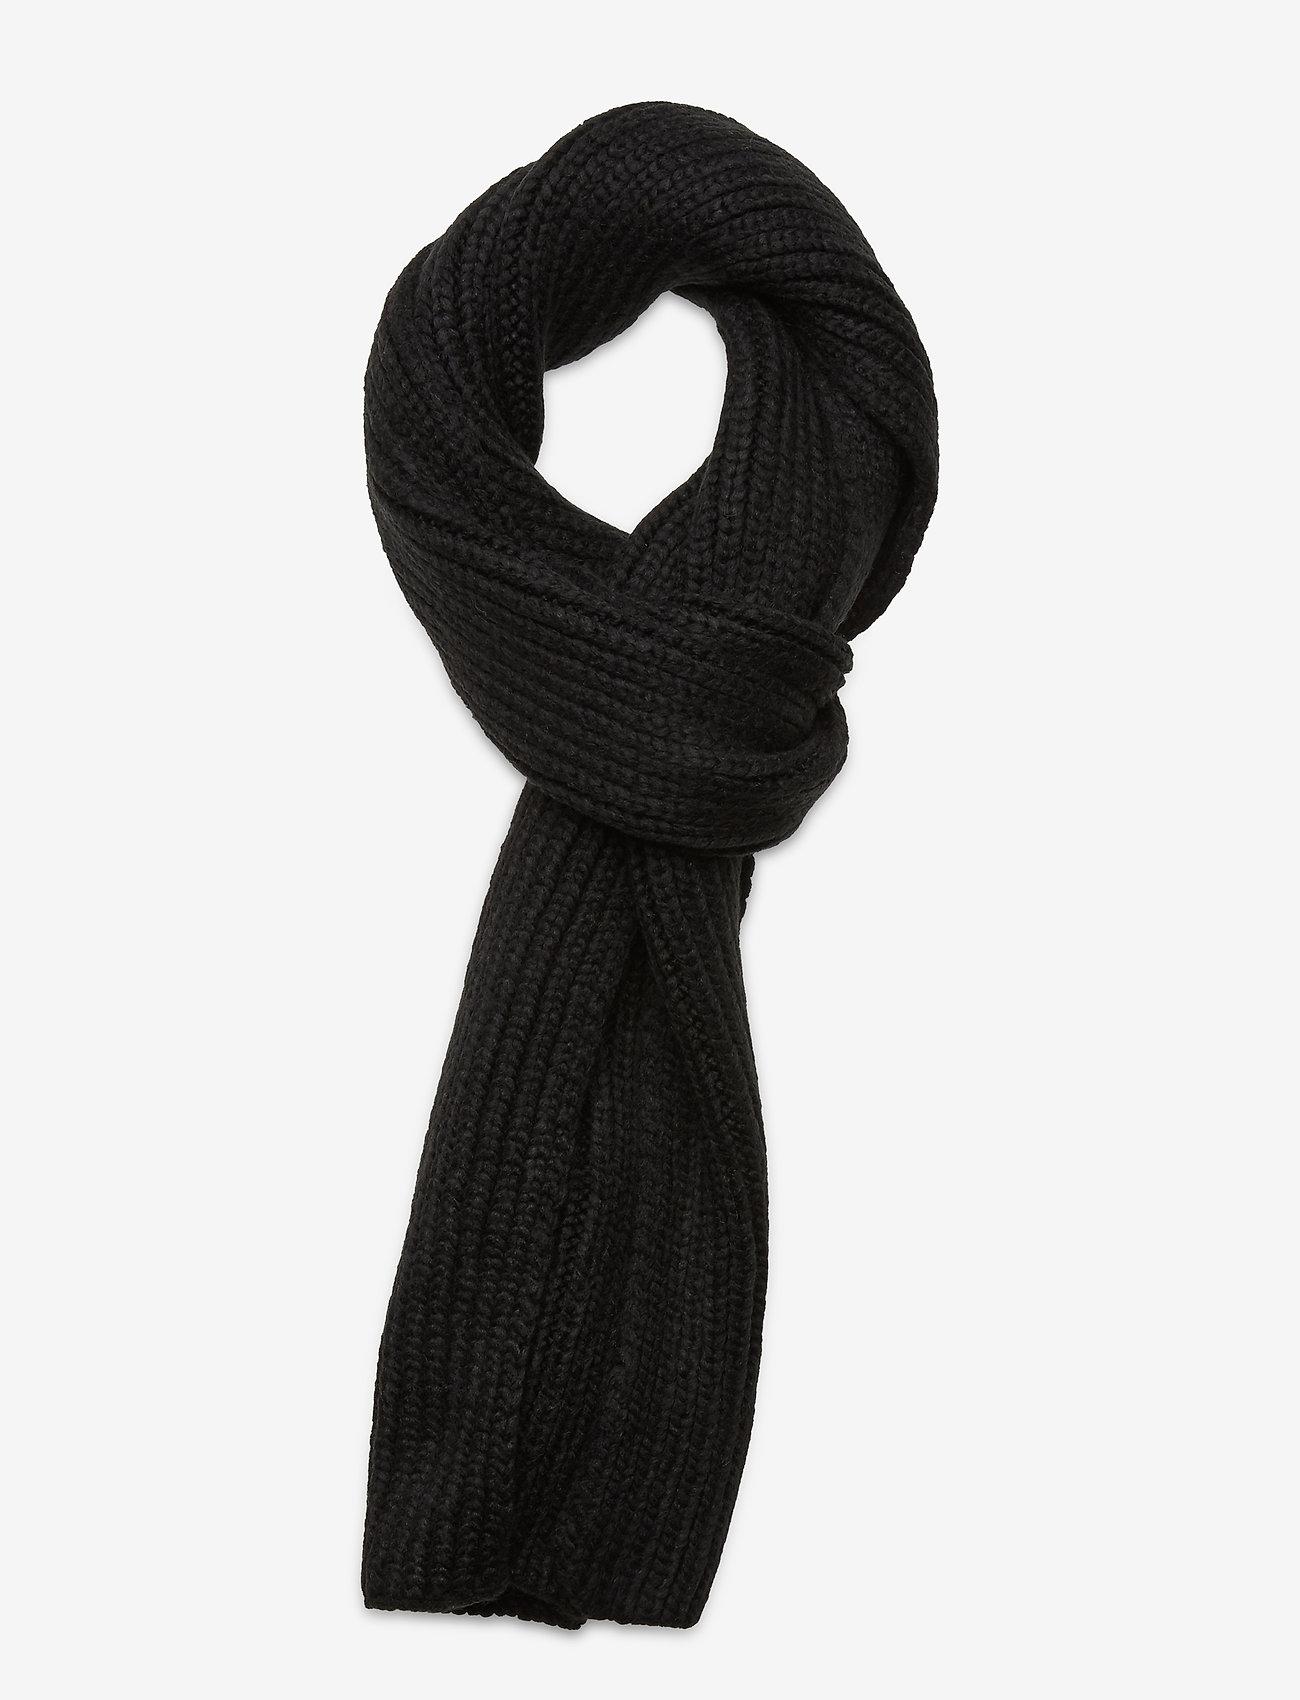 UGG - W CHUNKY RK SCARF - sjaals - black - 0